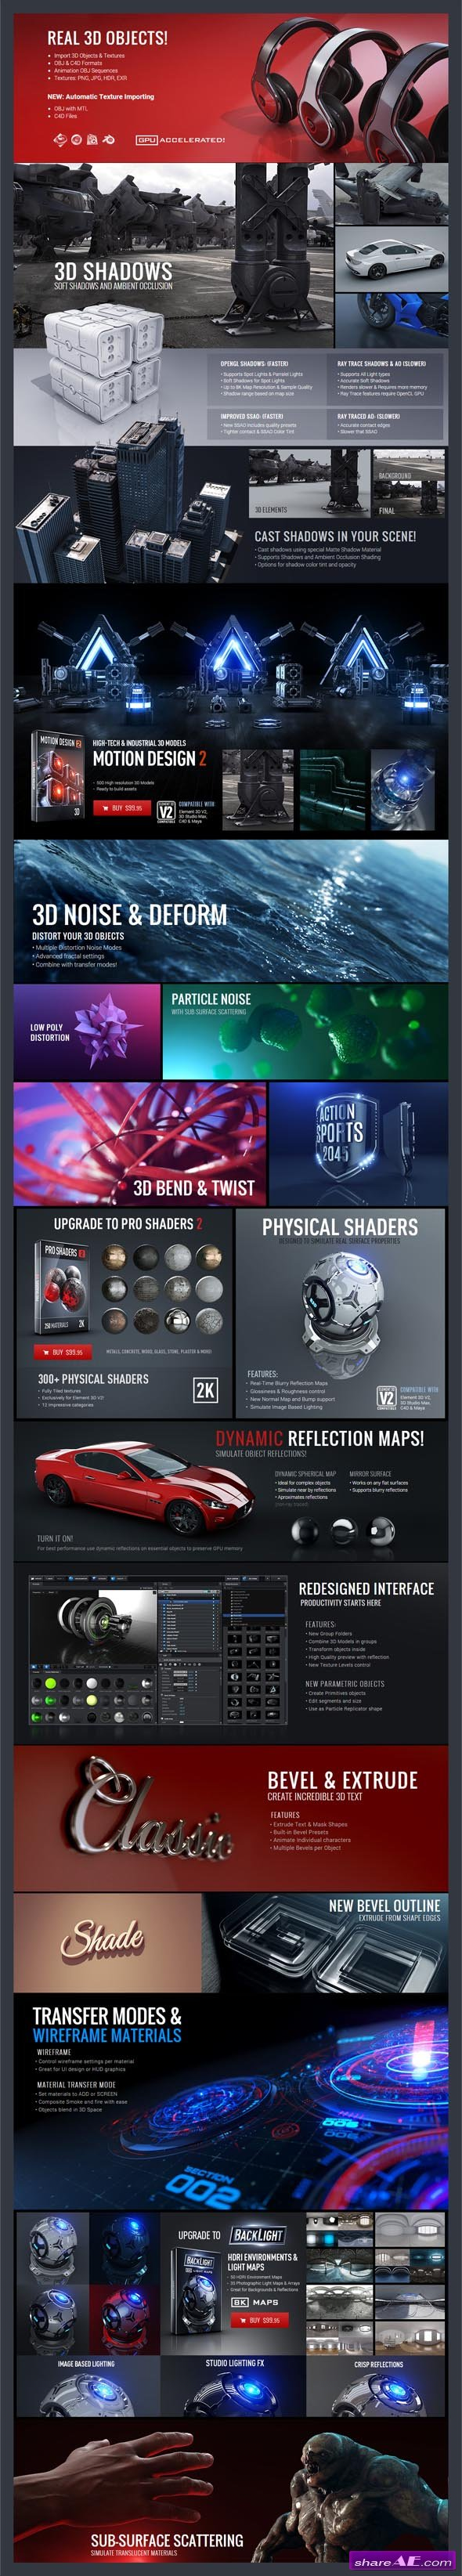 Pro Shaders 2 + BackLight + Motion Design 2 (WIN) - Video Copilot